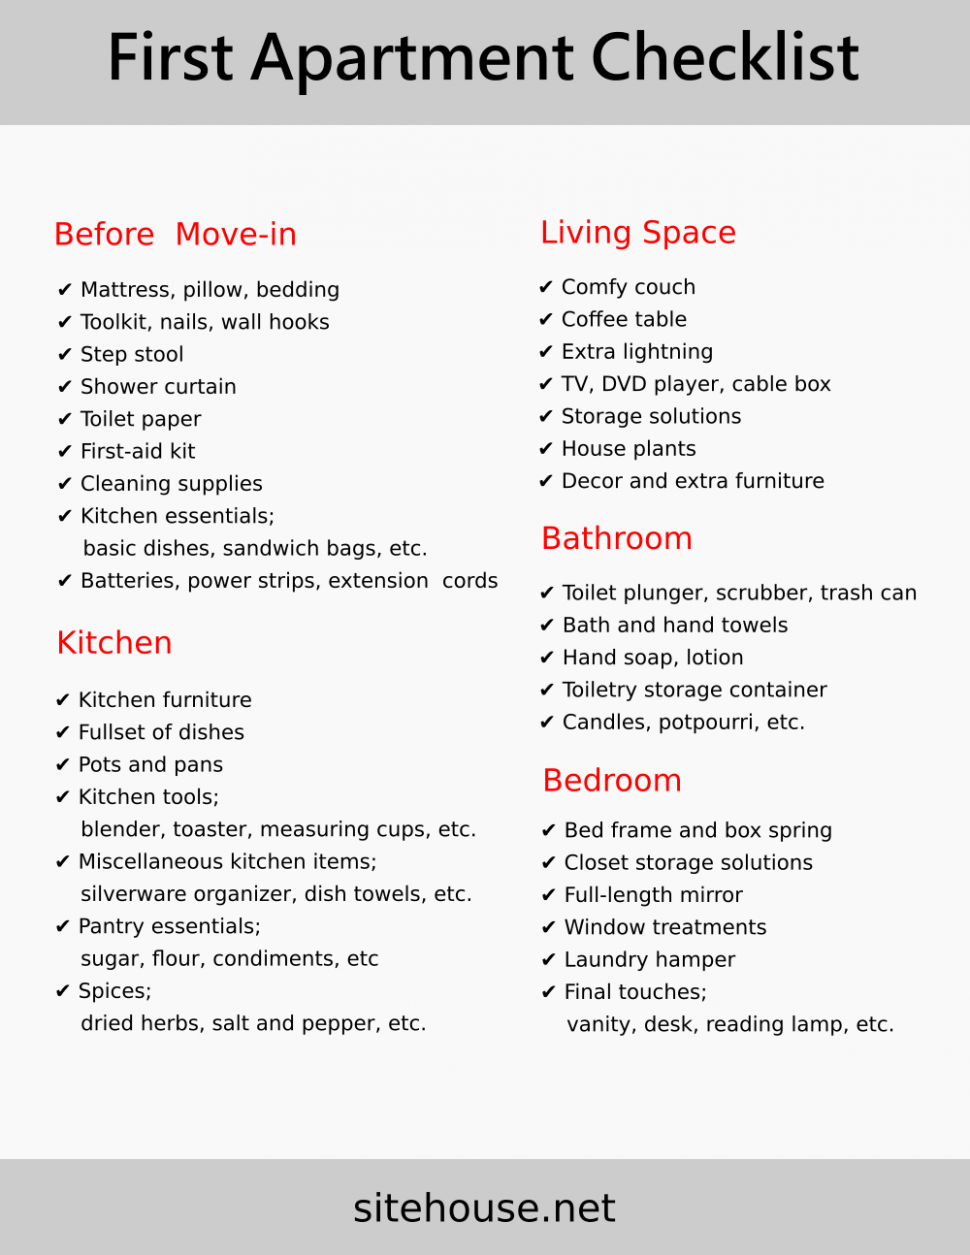 First Apartment Checklist and Design Ideas [Ultimate Guides  - Apartment Design Checklist